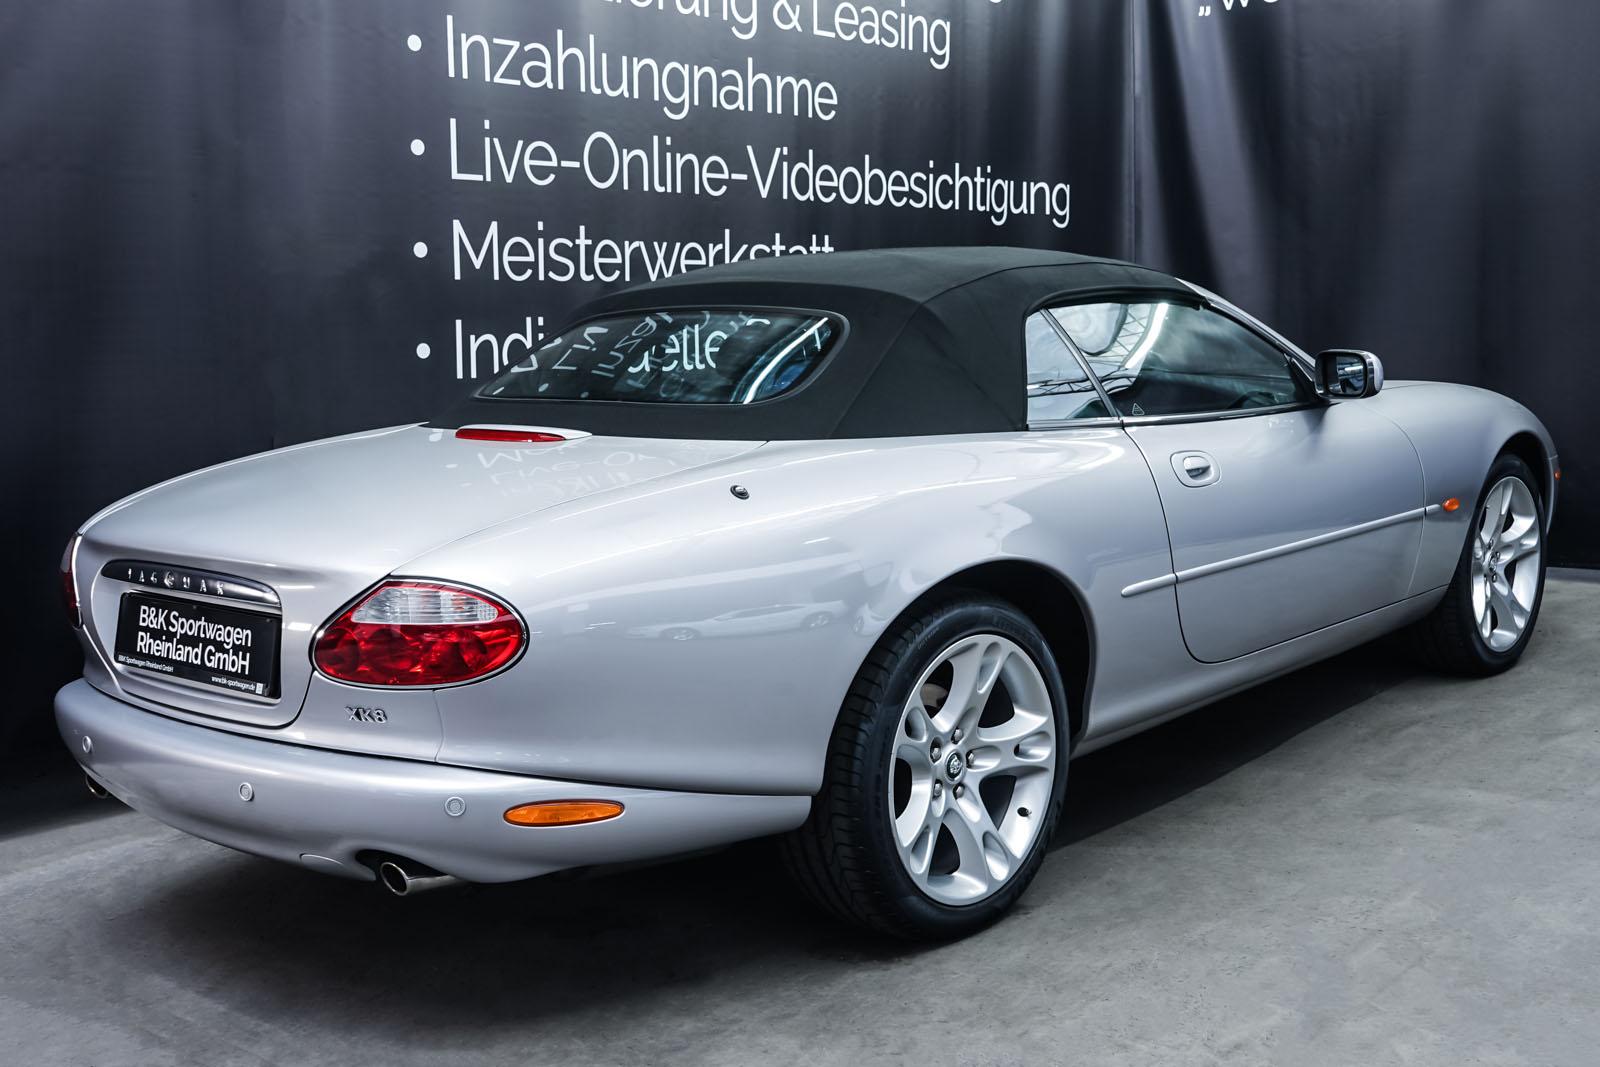 Jaguar_XK8_4.0_Silber_Schwarz_JAG-9731_21_w